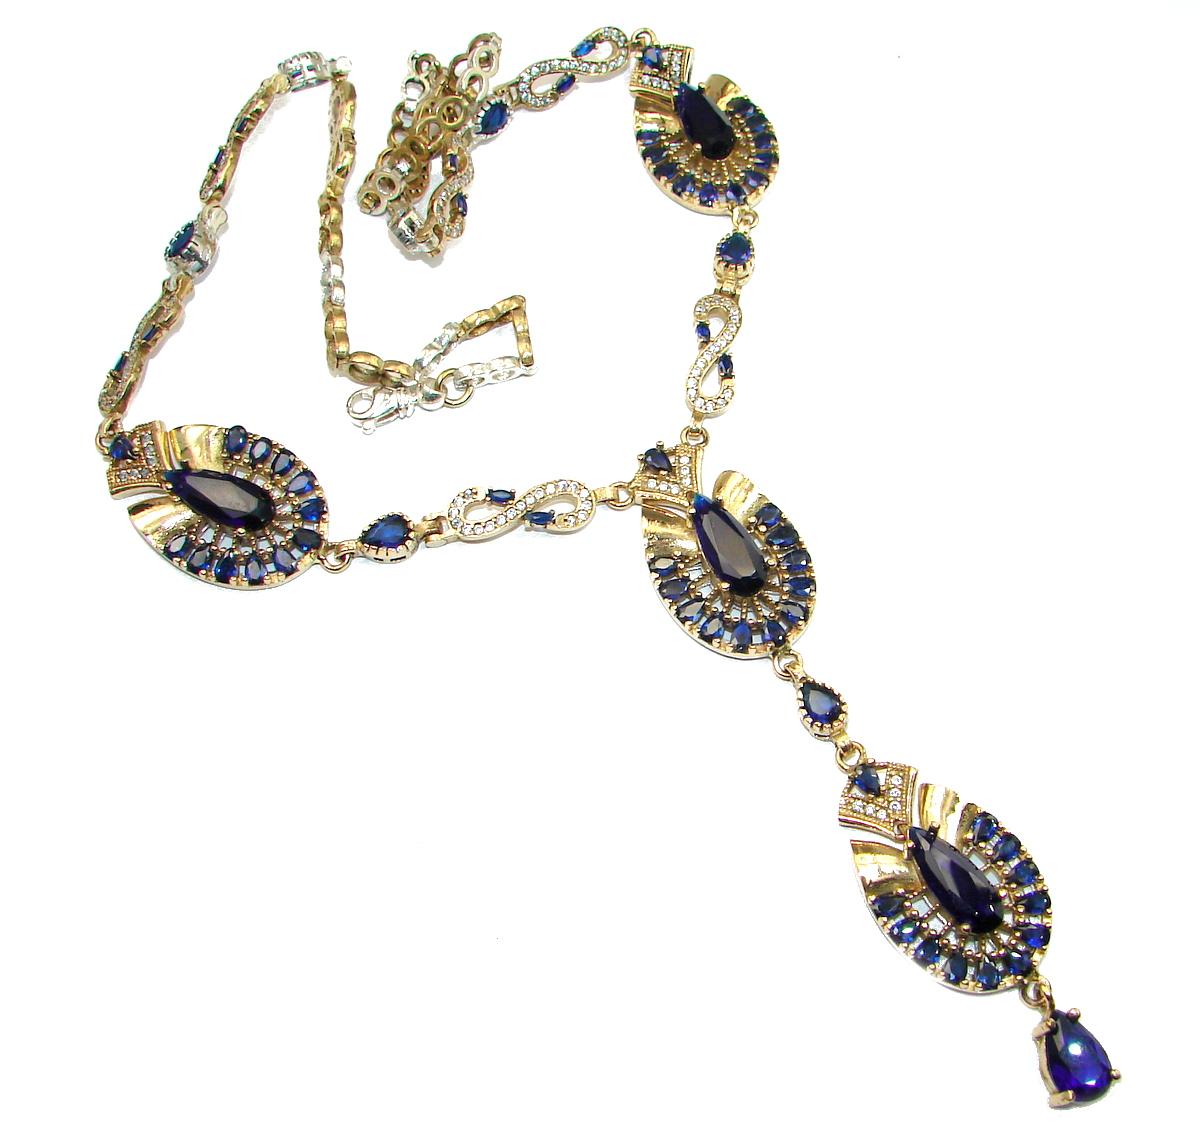 f1c663da0 Victorian Style Created Dark Sapphire & White Topaz Sterling Silver necklace